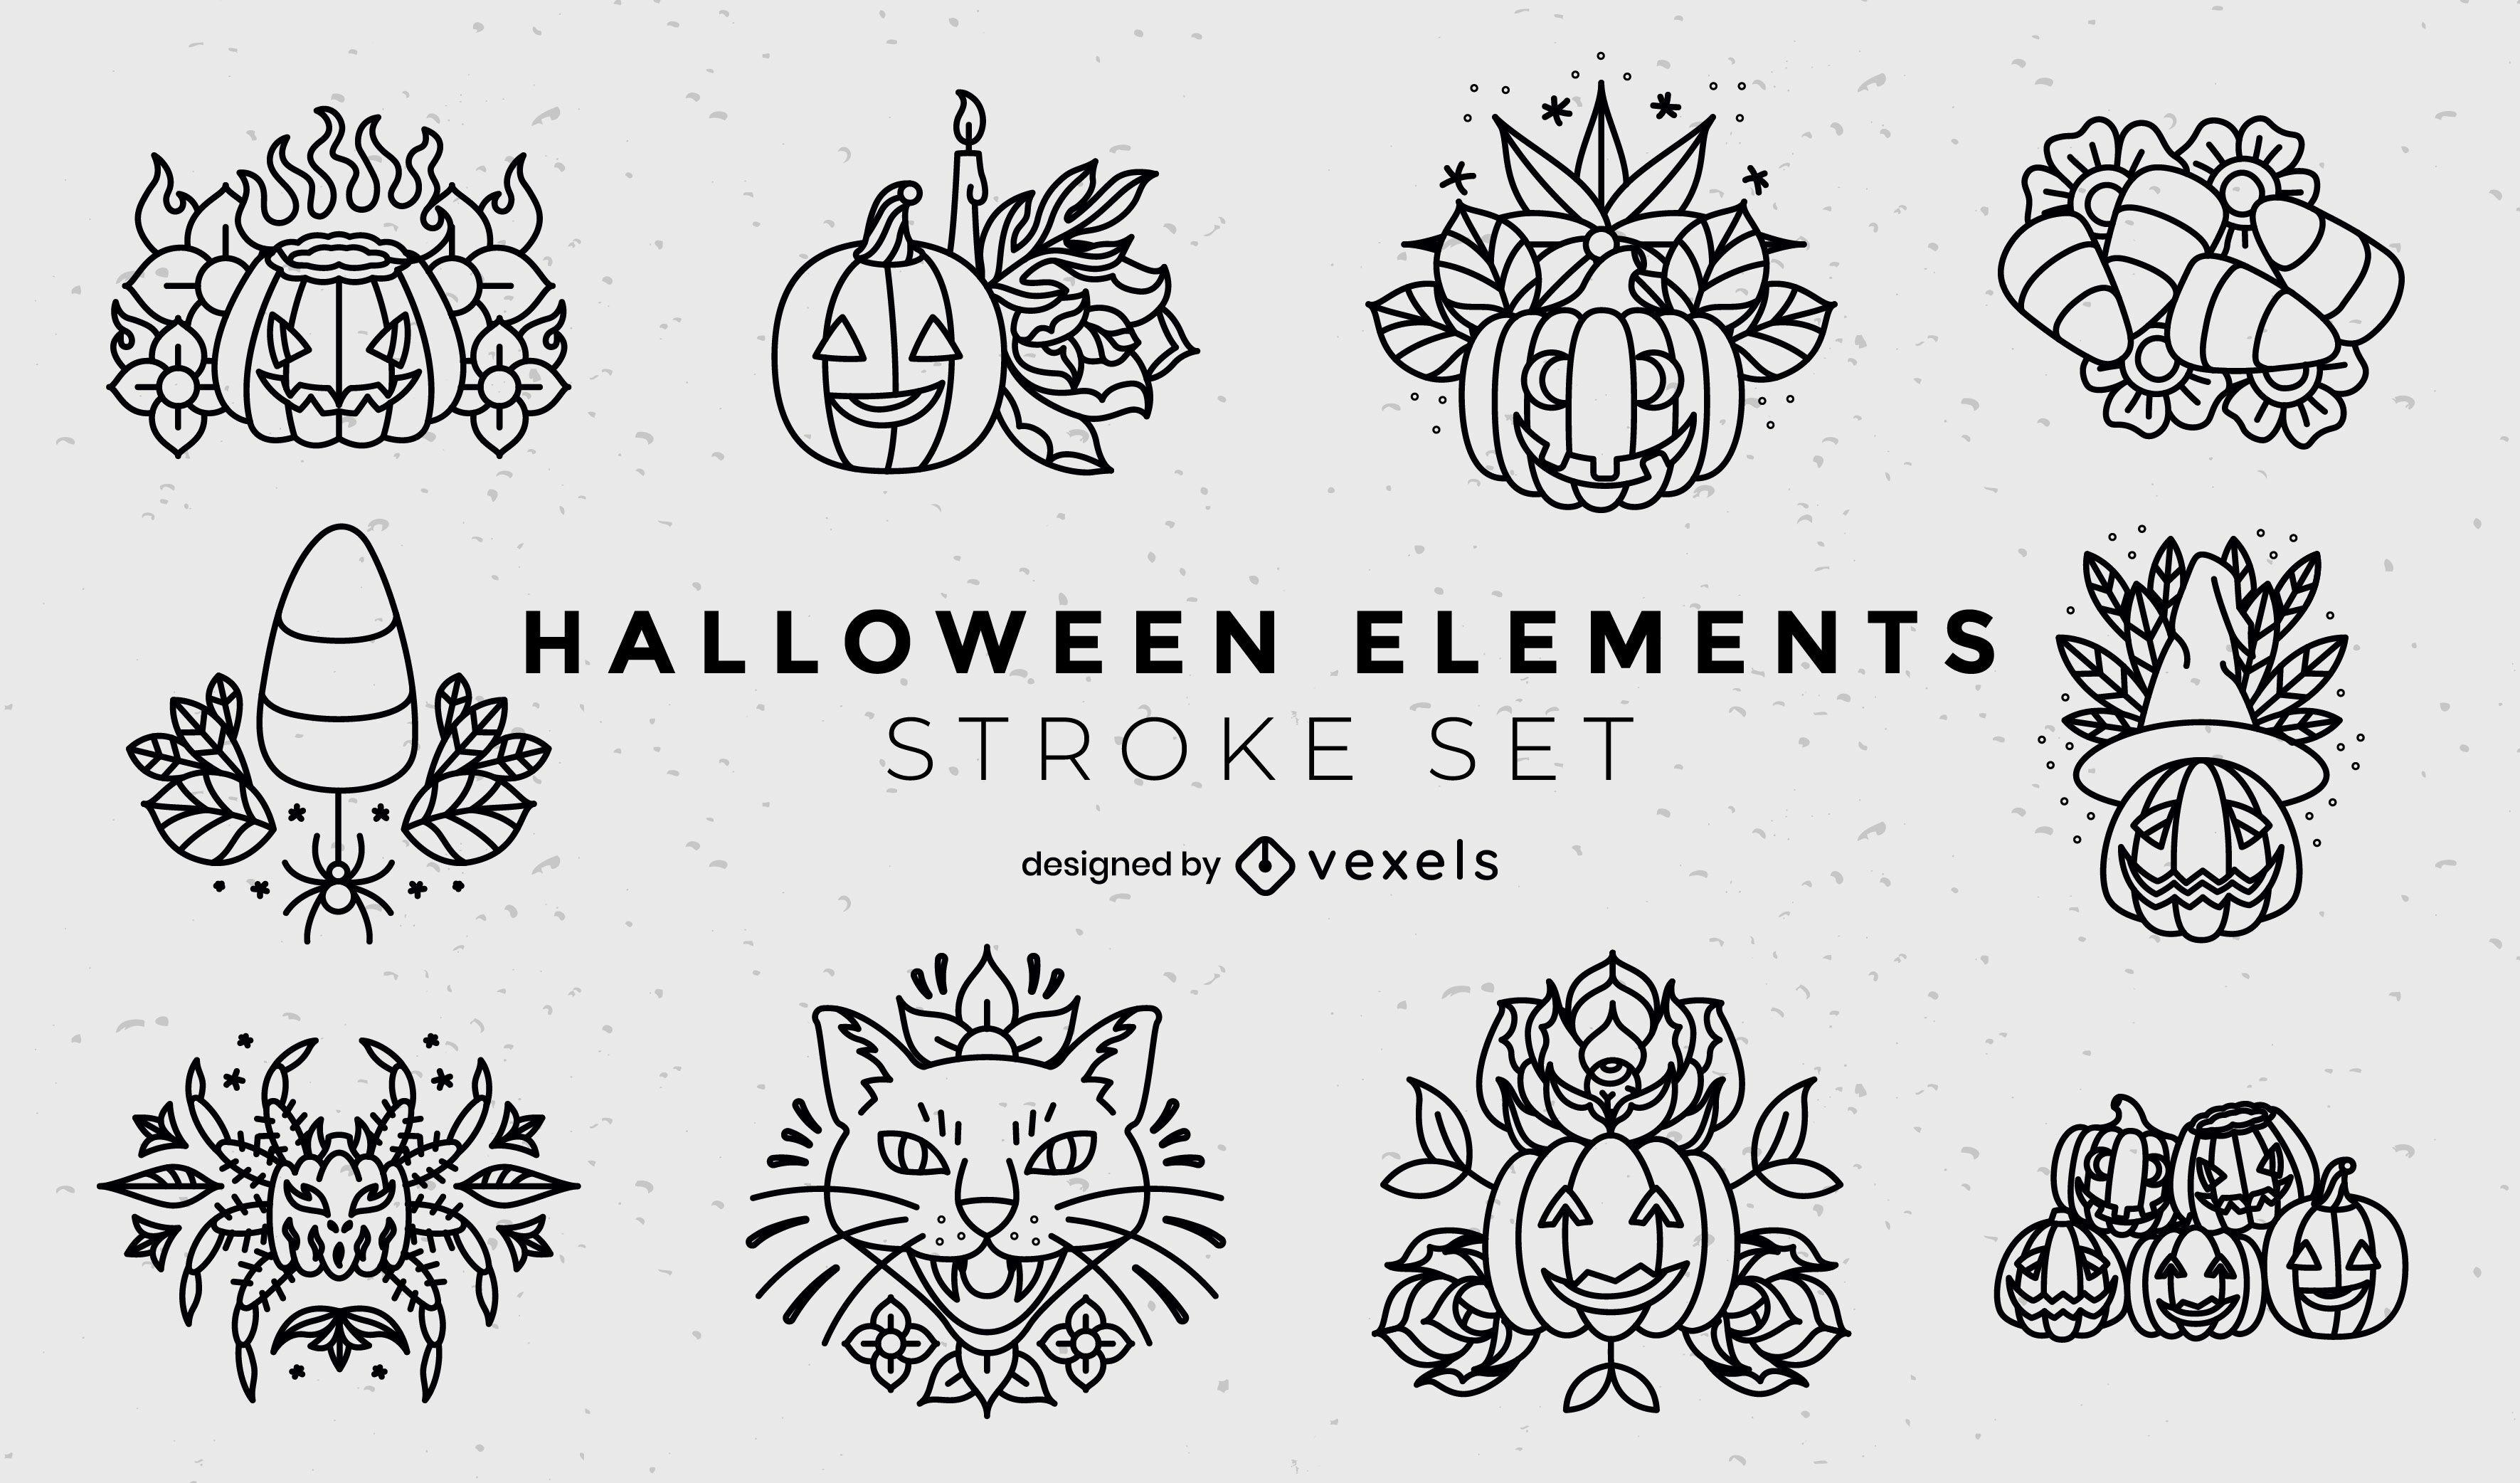 Fiesta de halloween jack o lanterns trazo conjunto